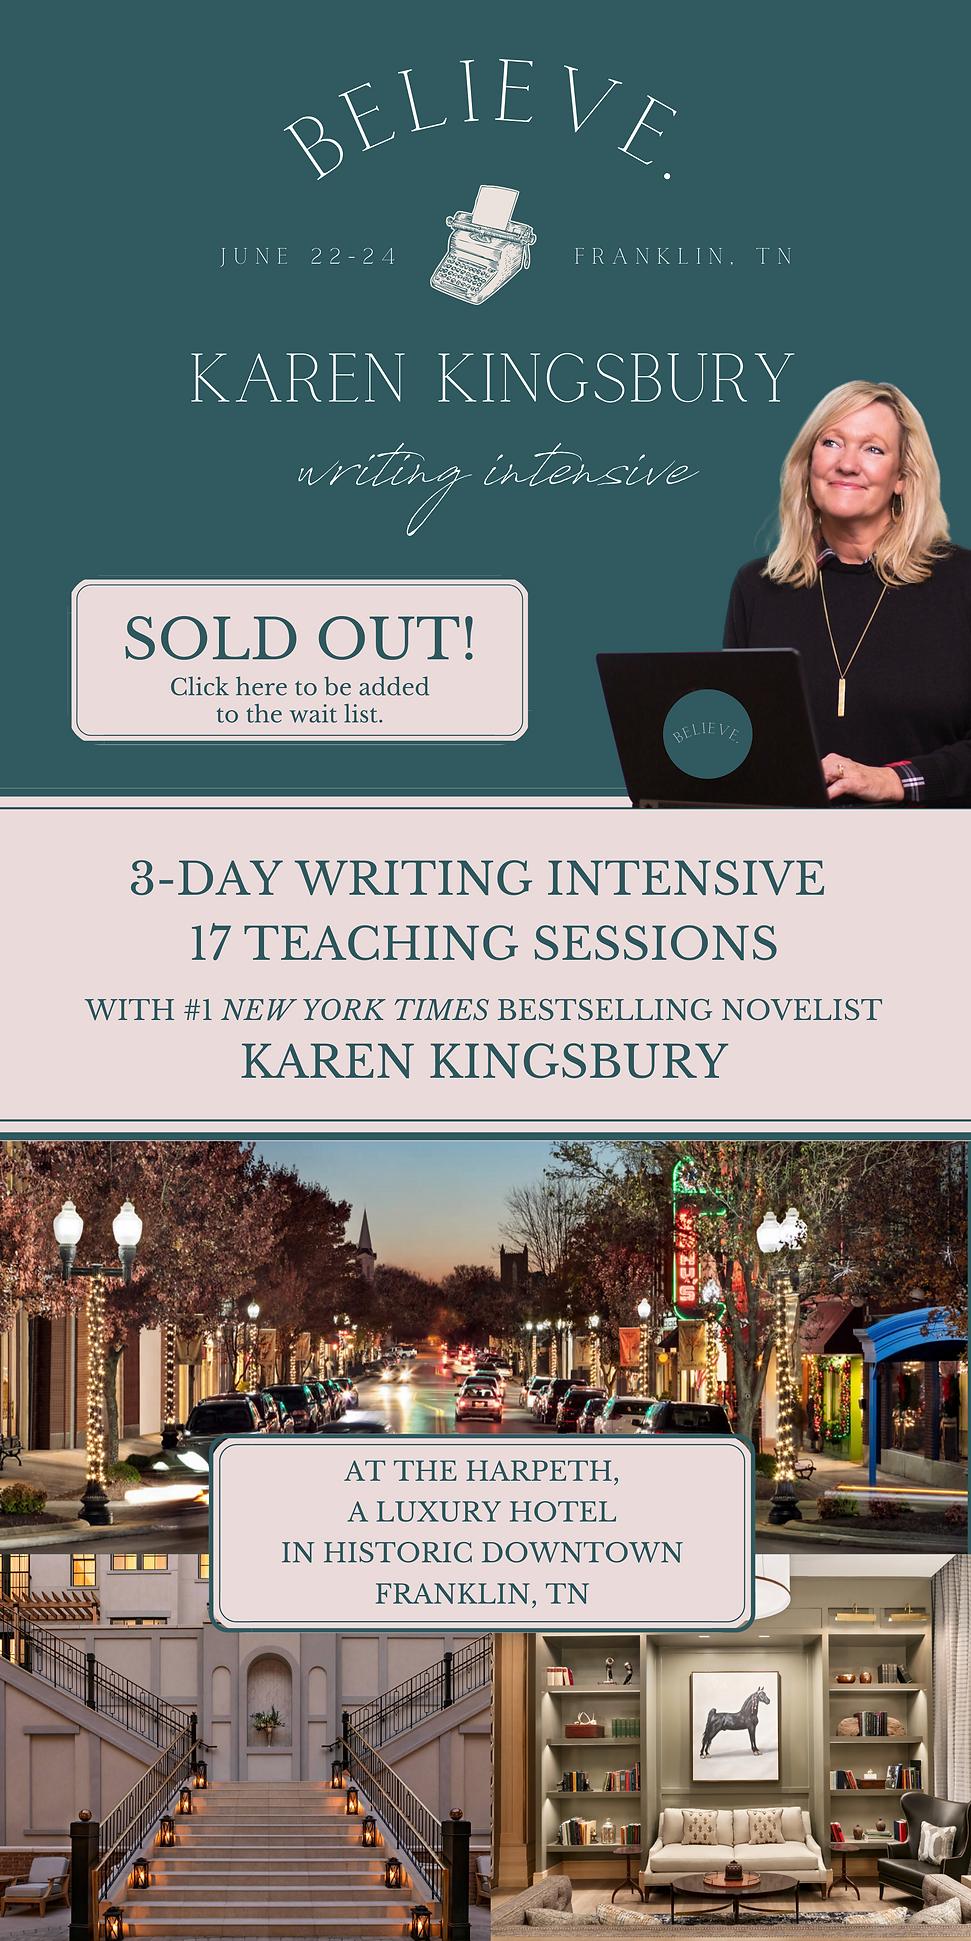 BELIEVE - Karen Kingsbury Writing Intens